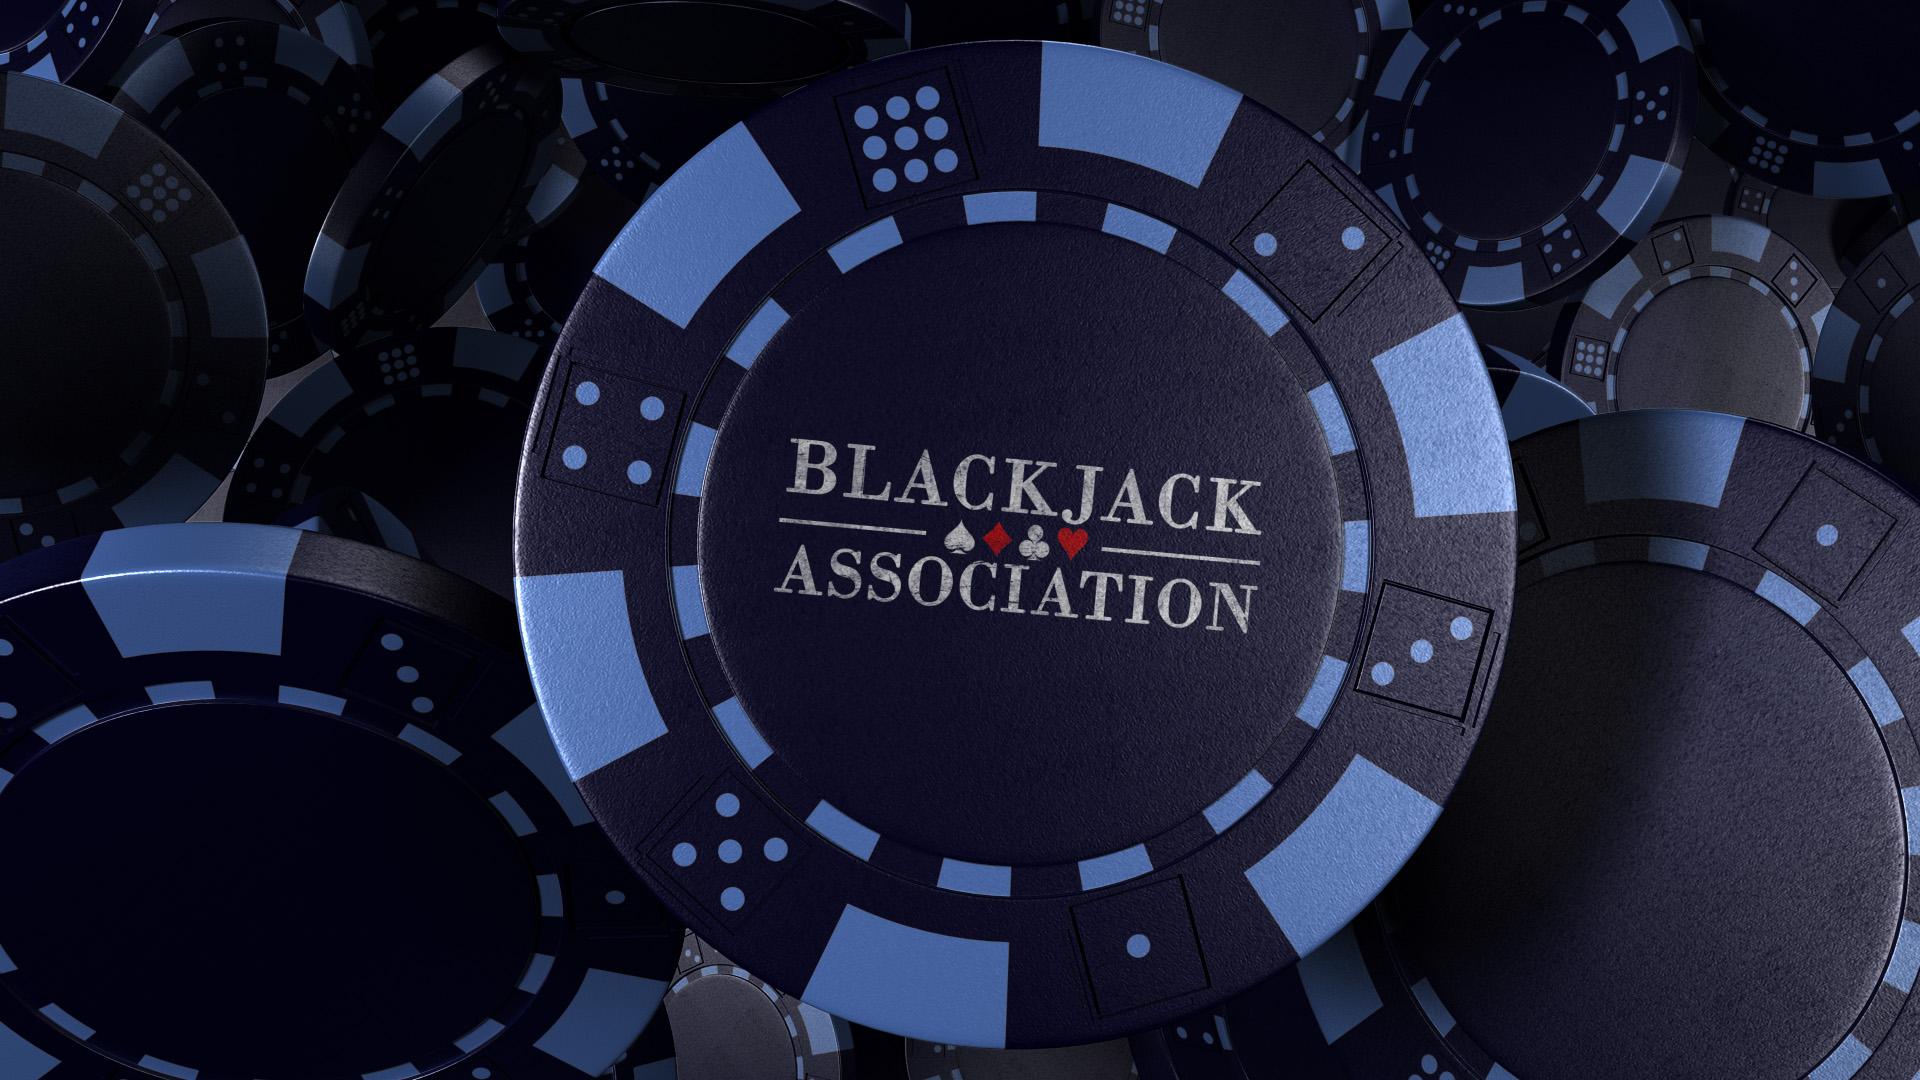 Blackjack Association